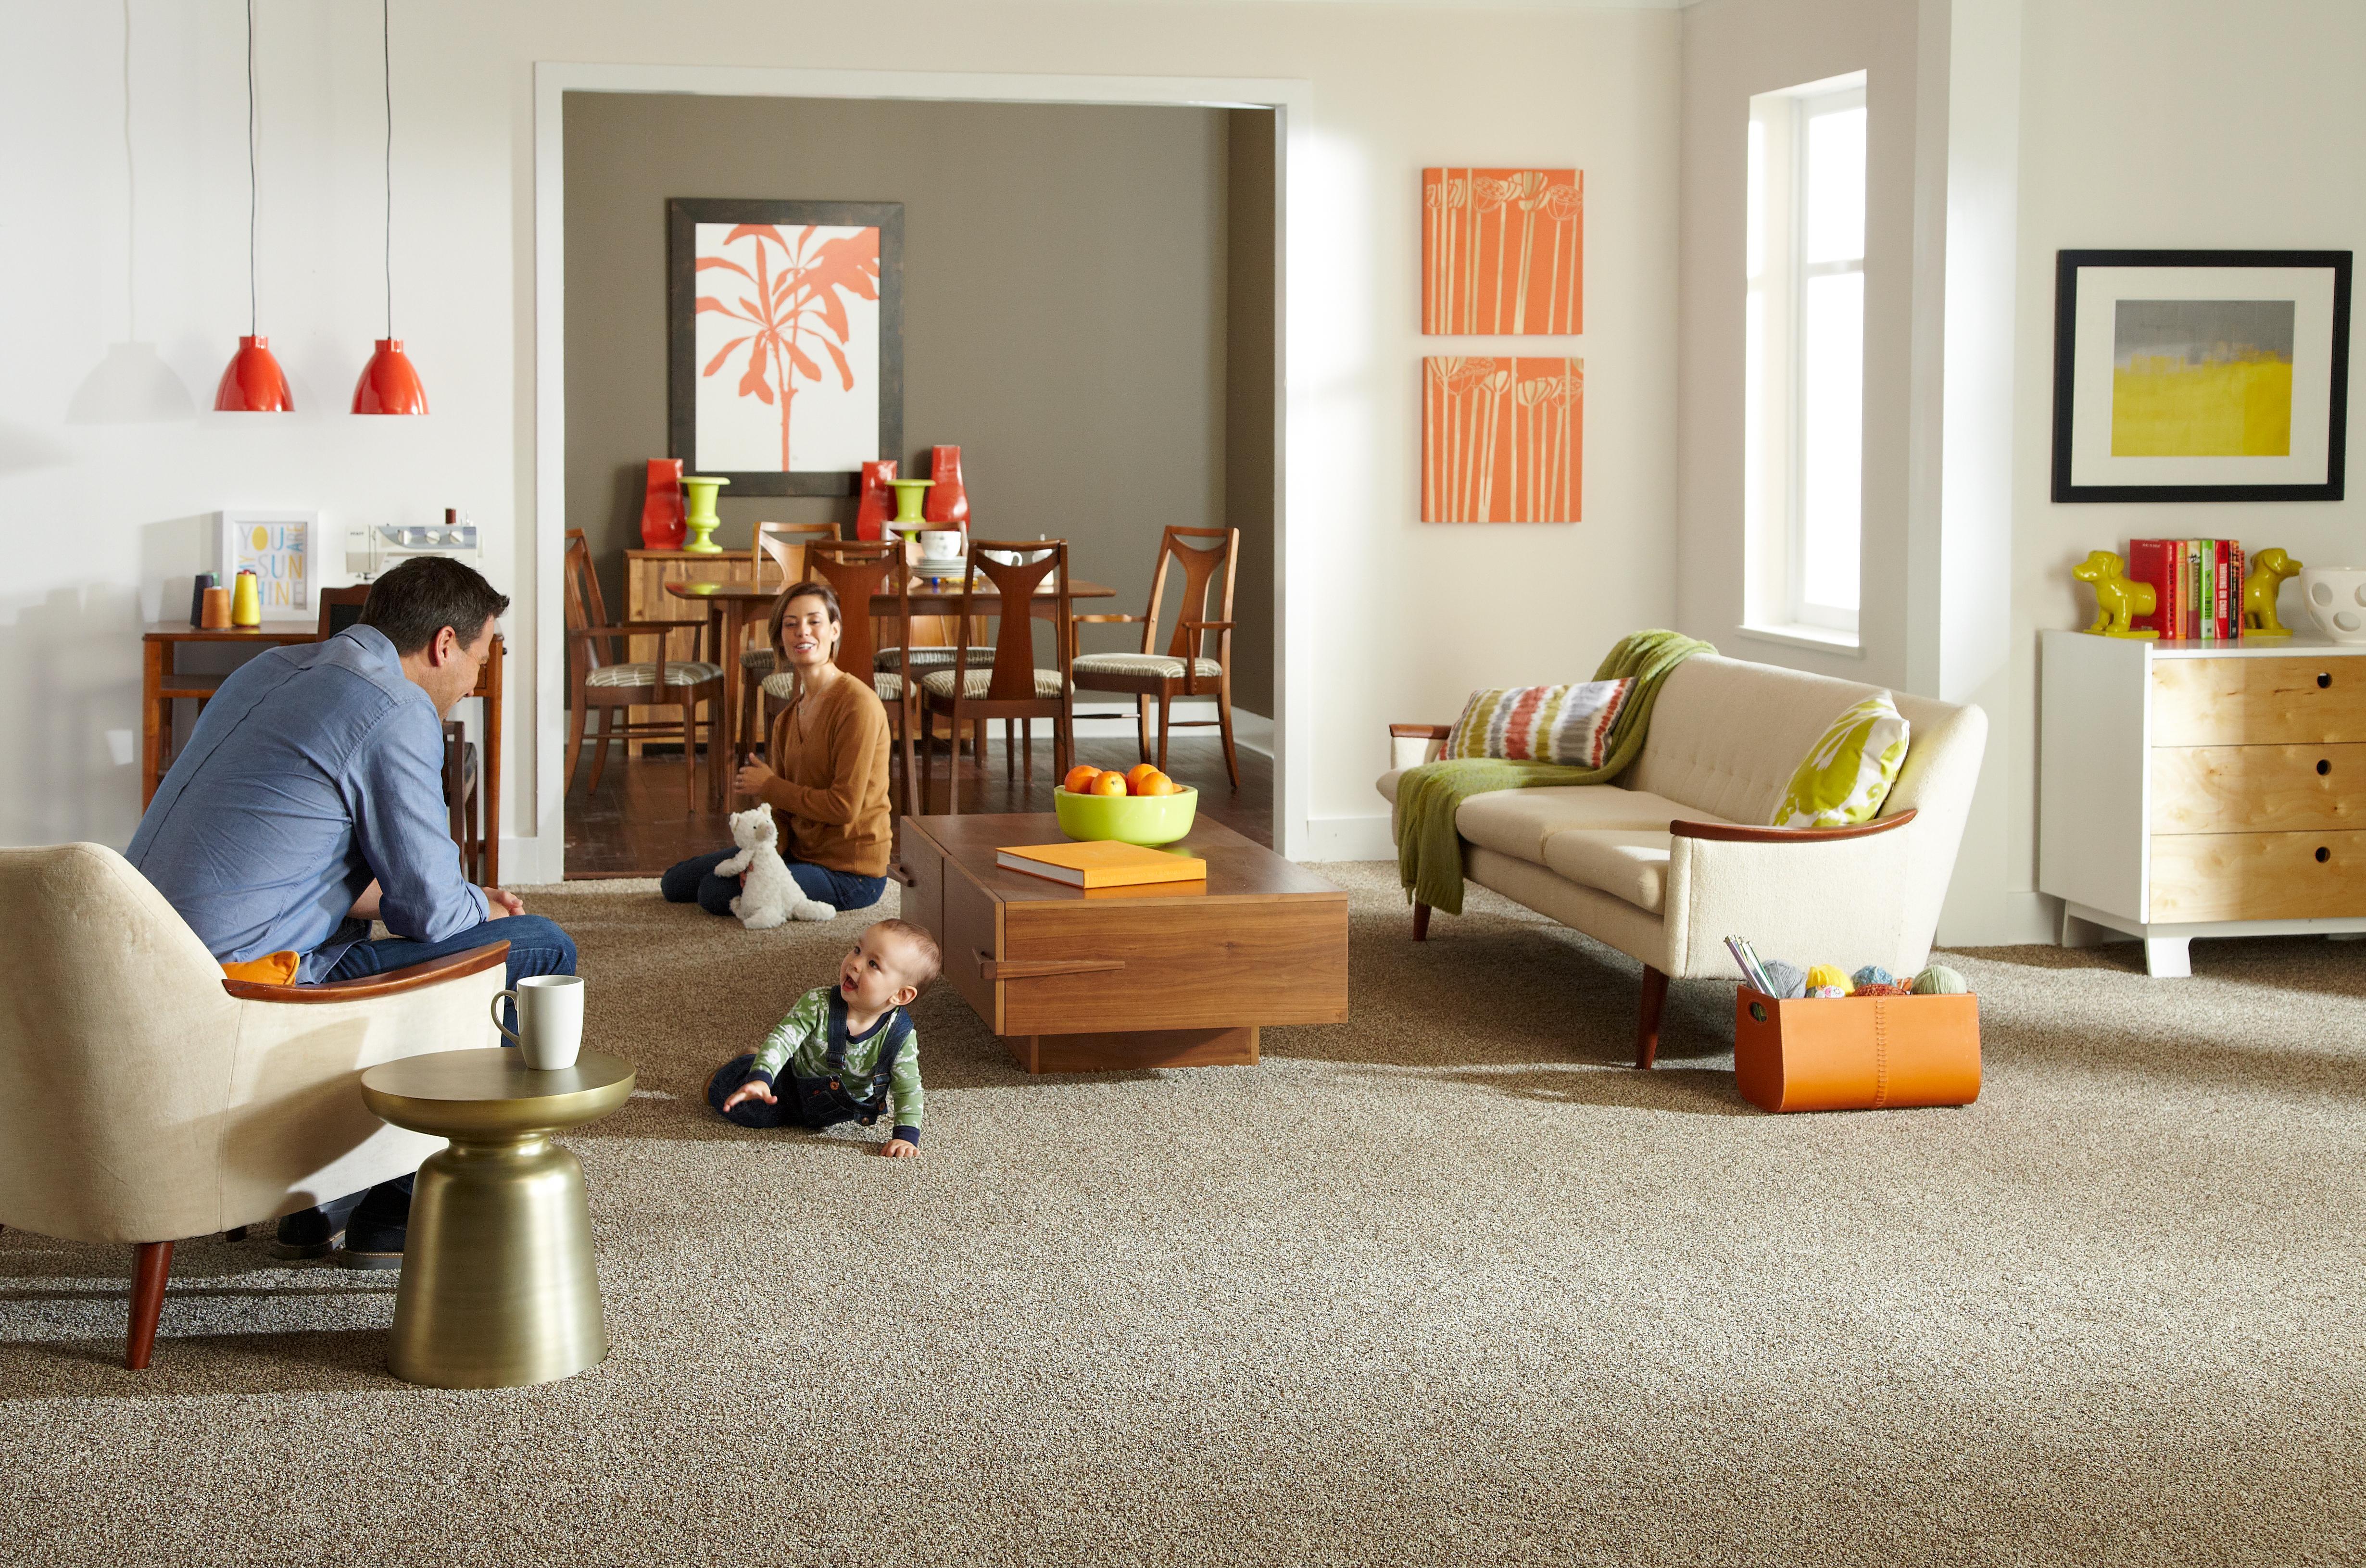 Carpet Remnants Michigan Centerfordemocracy Org